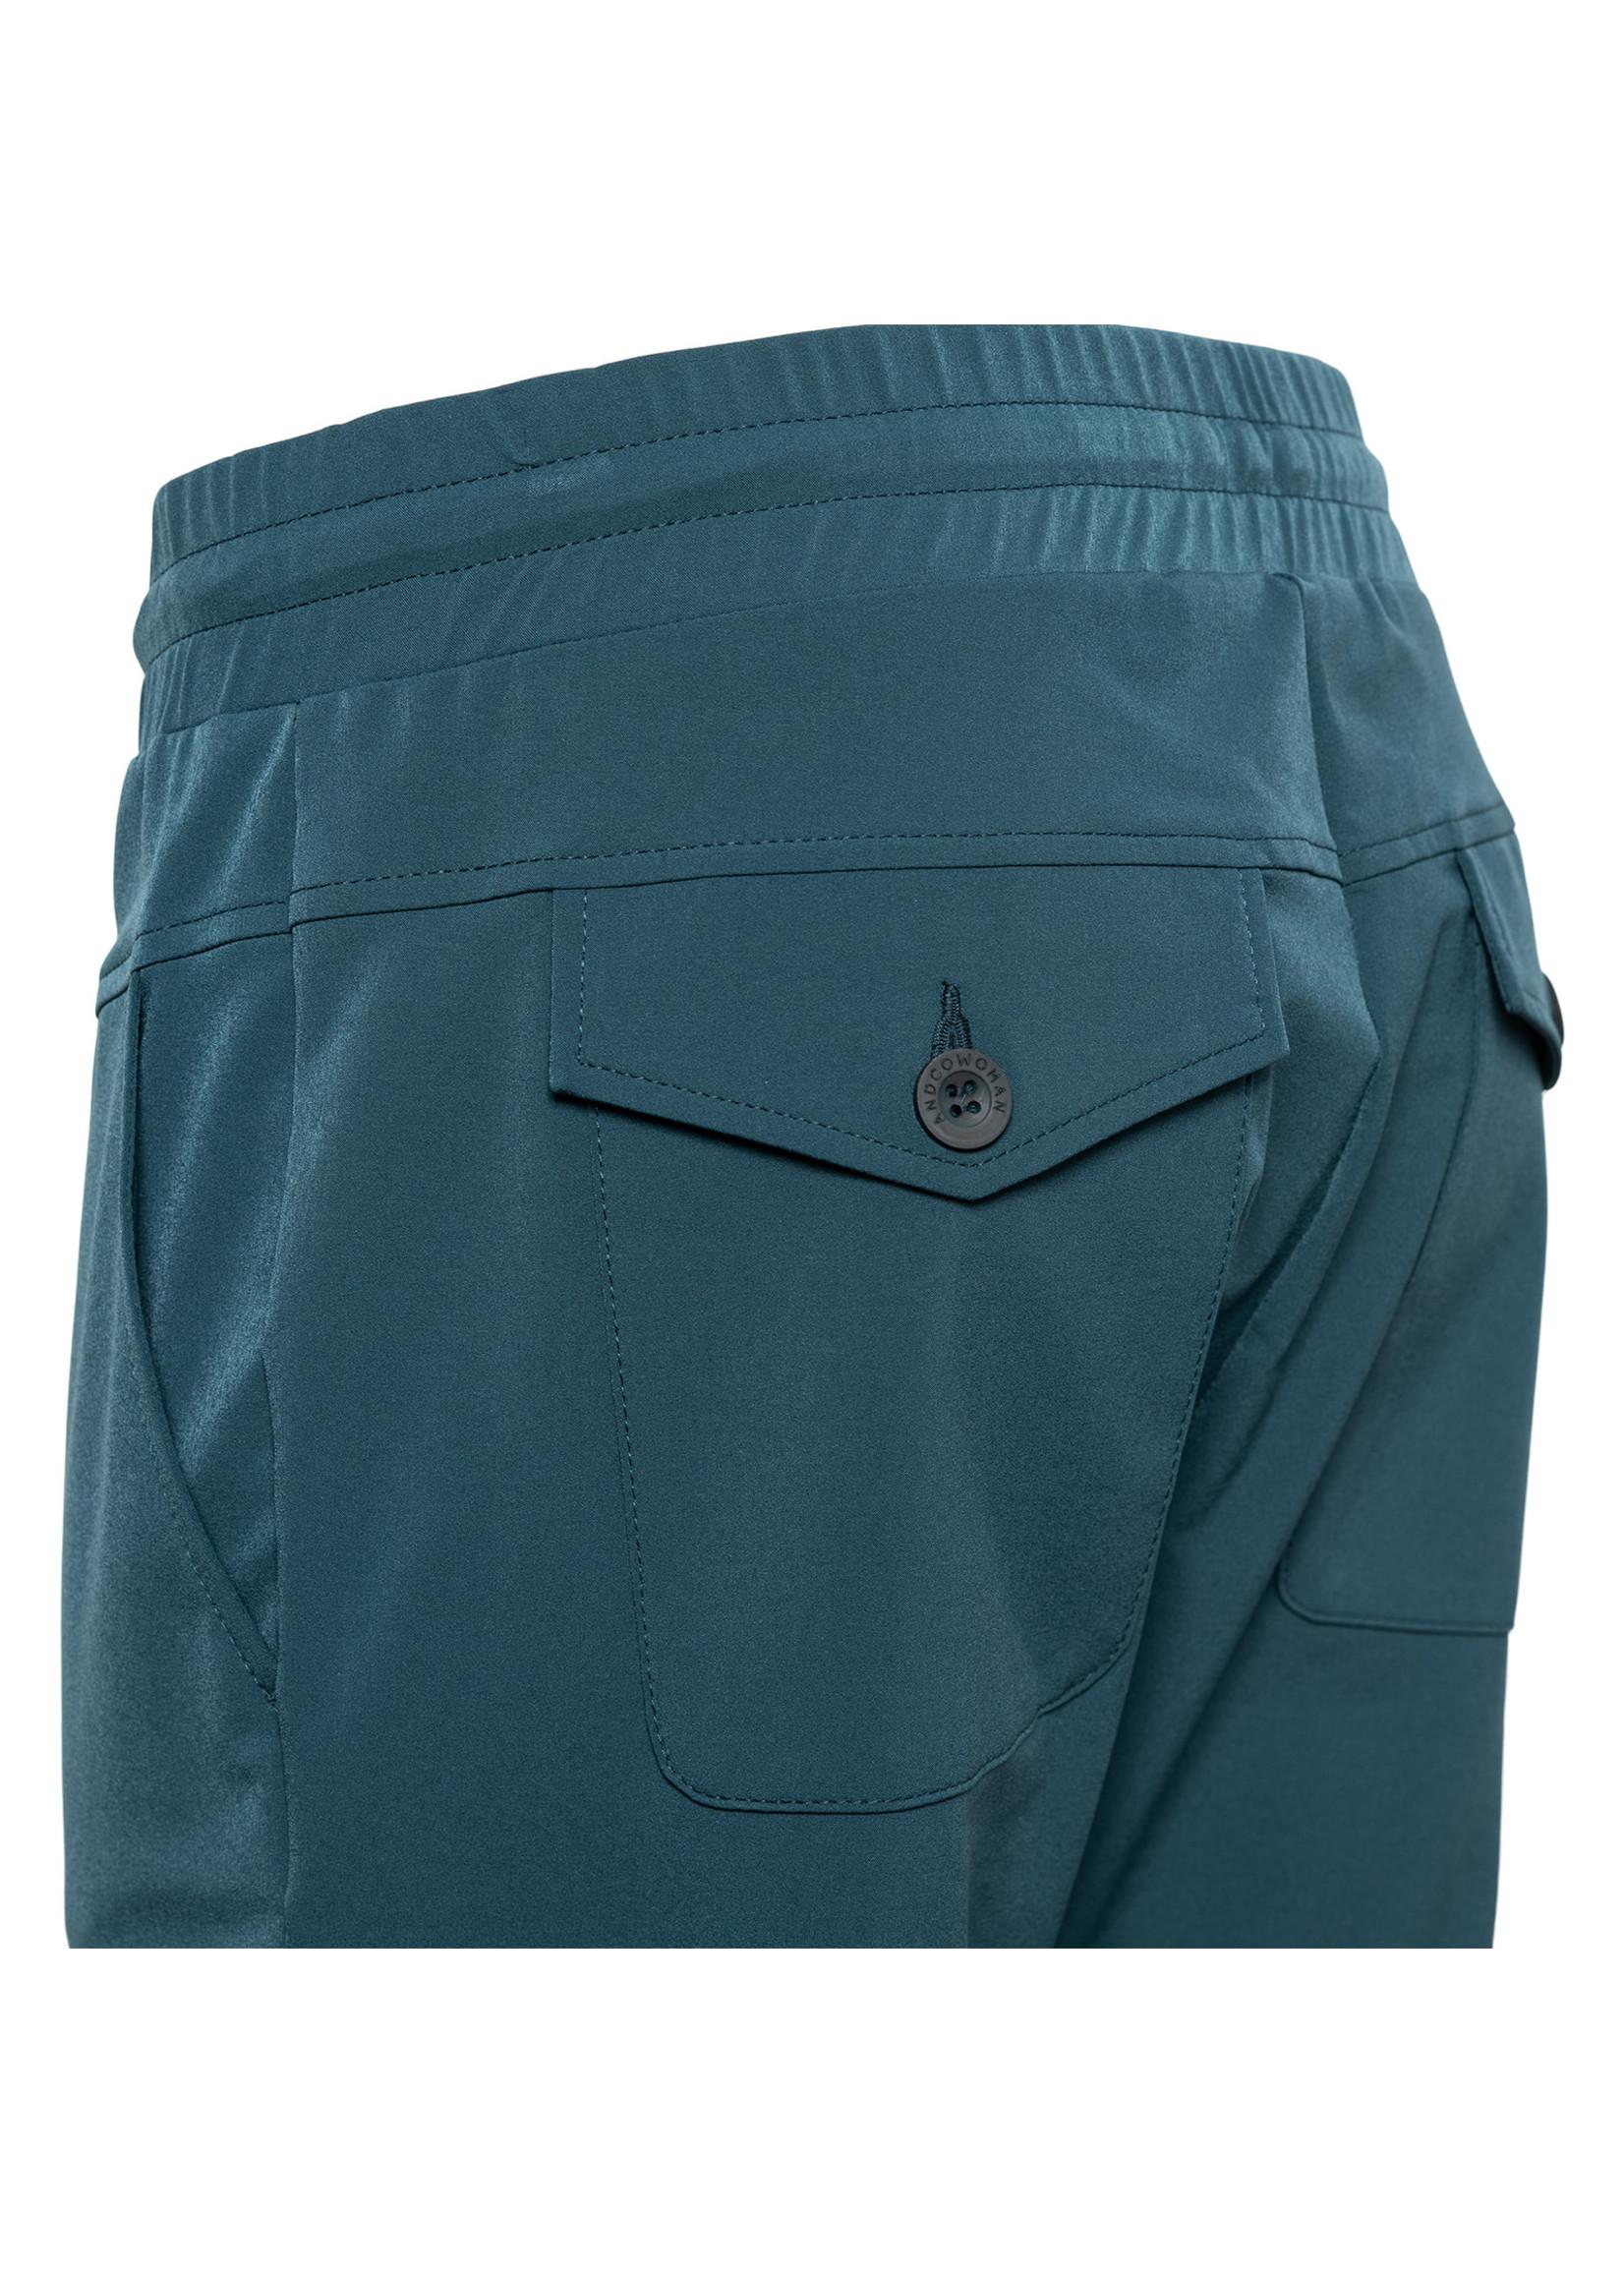 &Co Women penny pants (pine green)